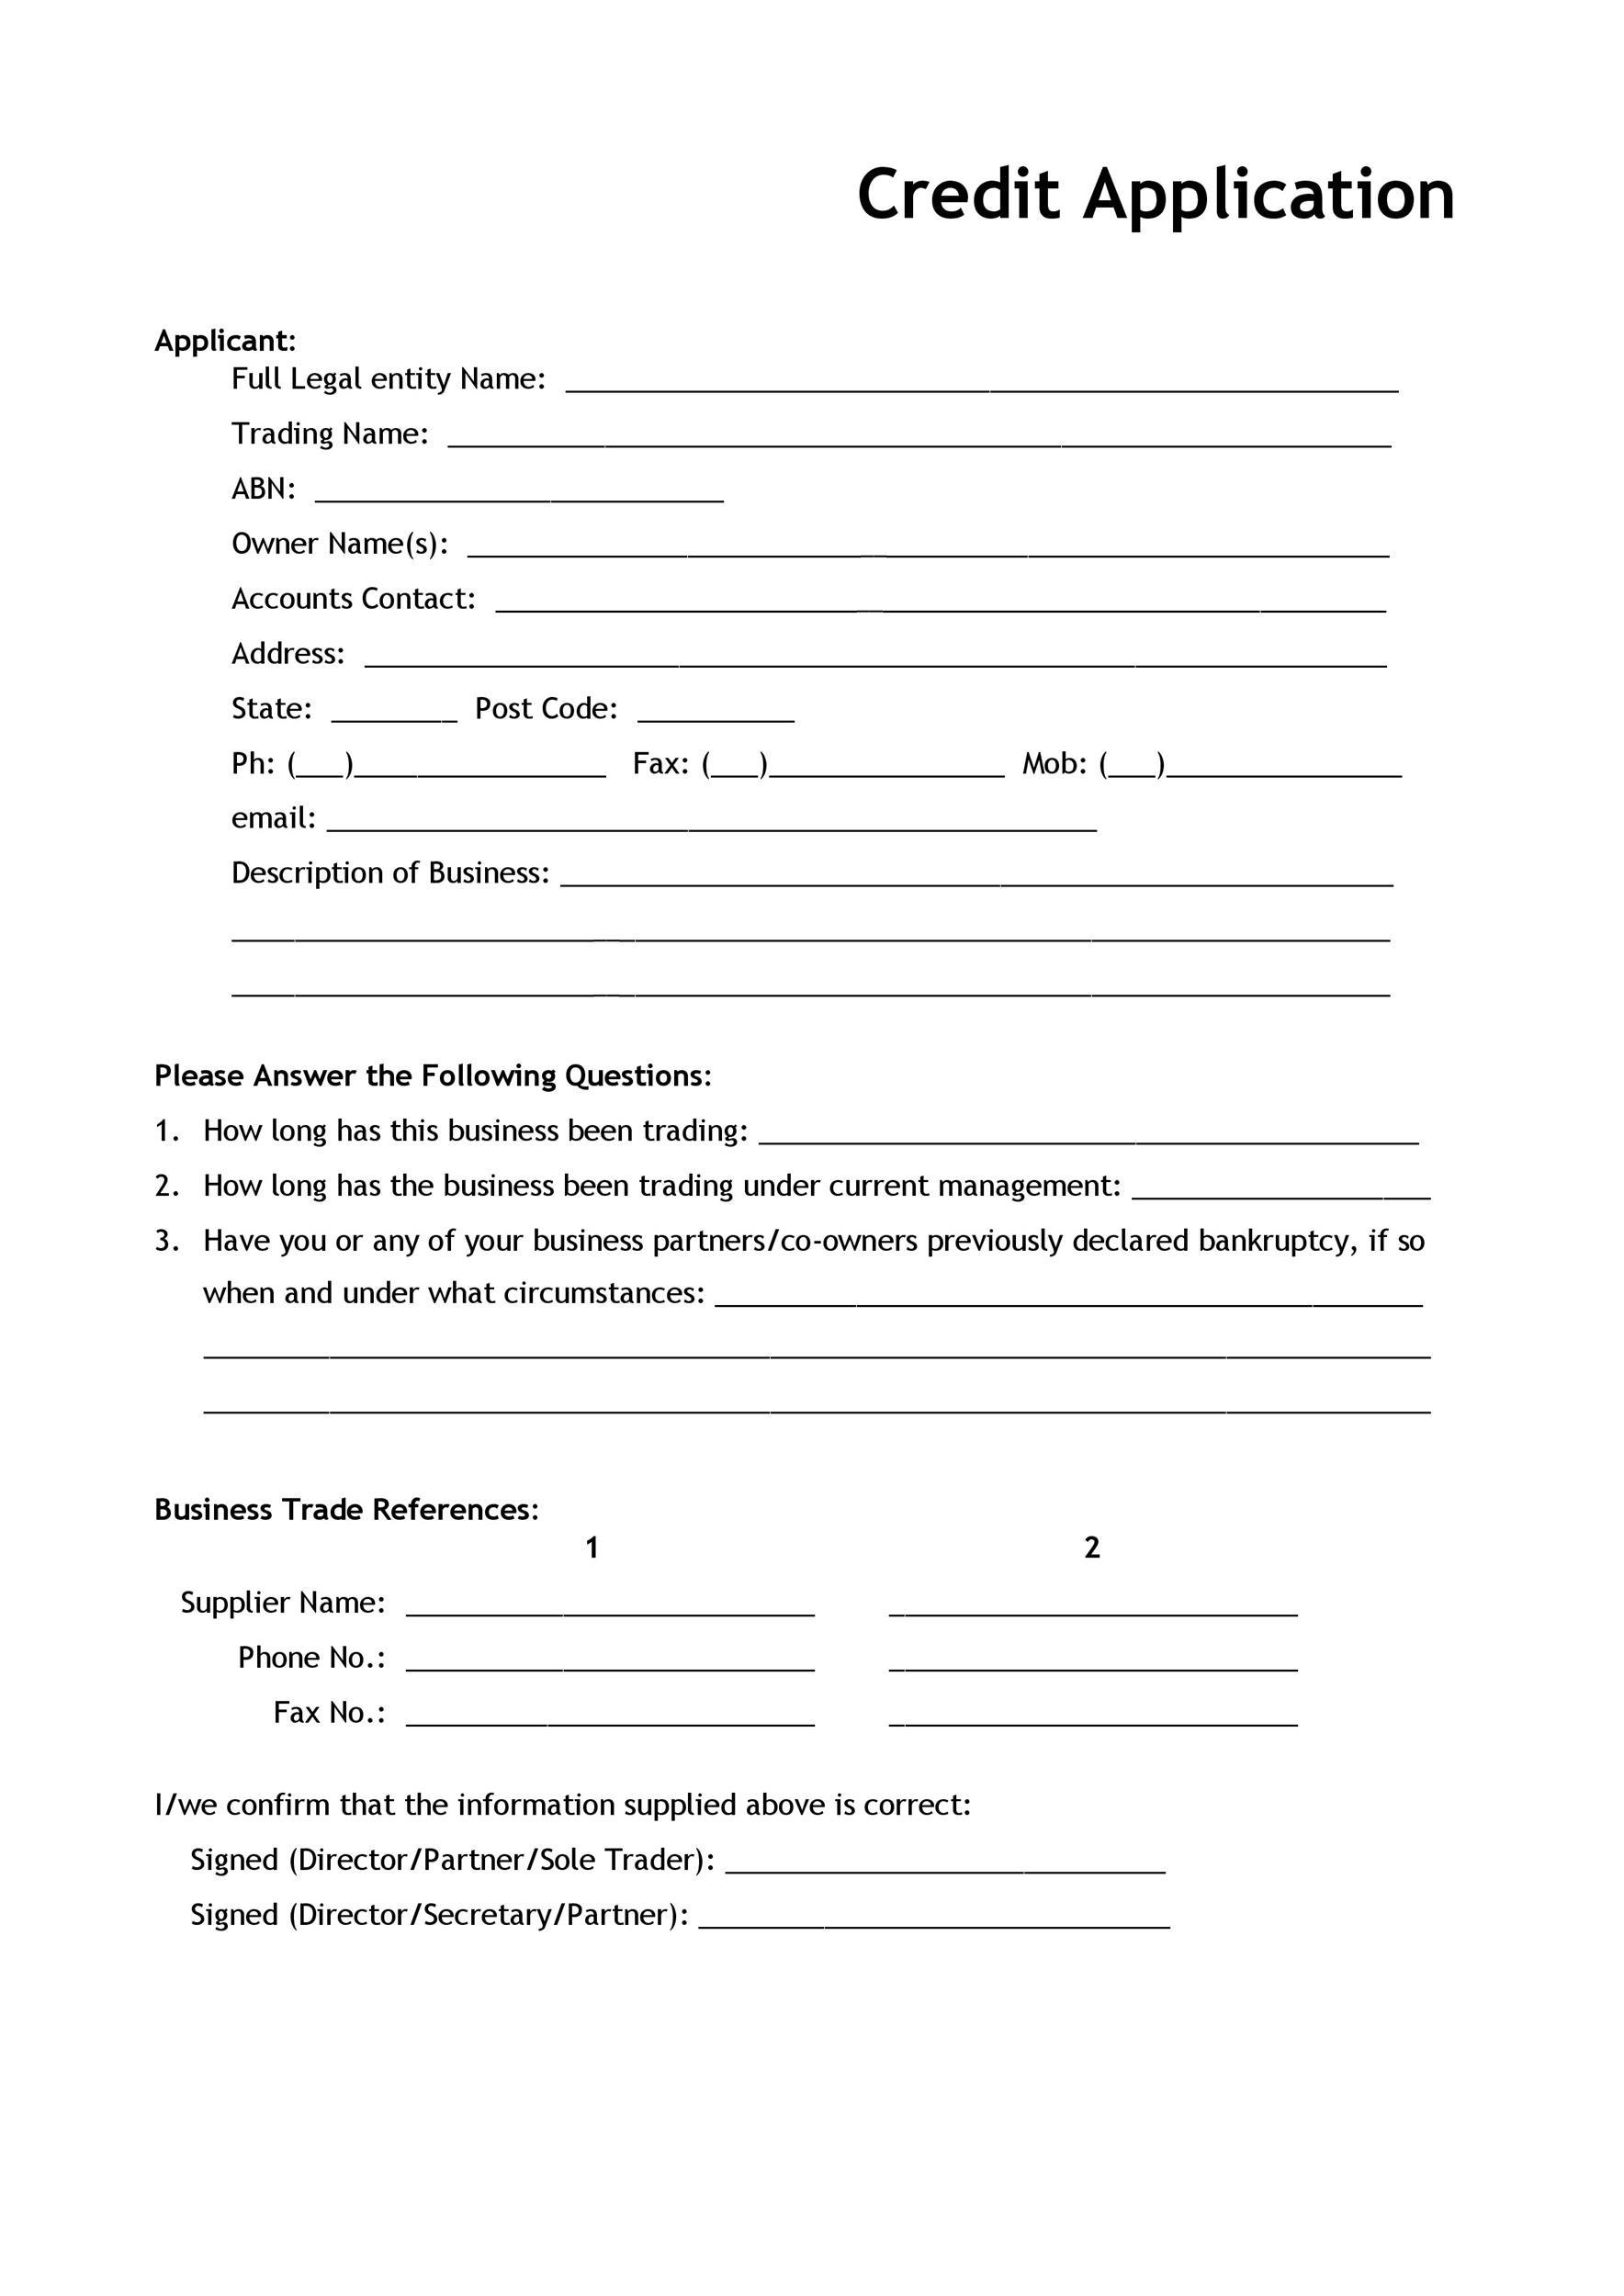 Free Credit Application Form 40